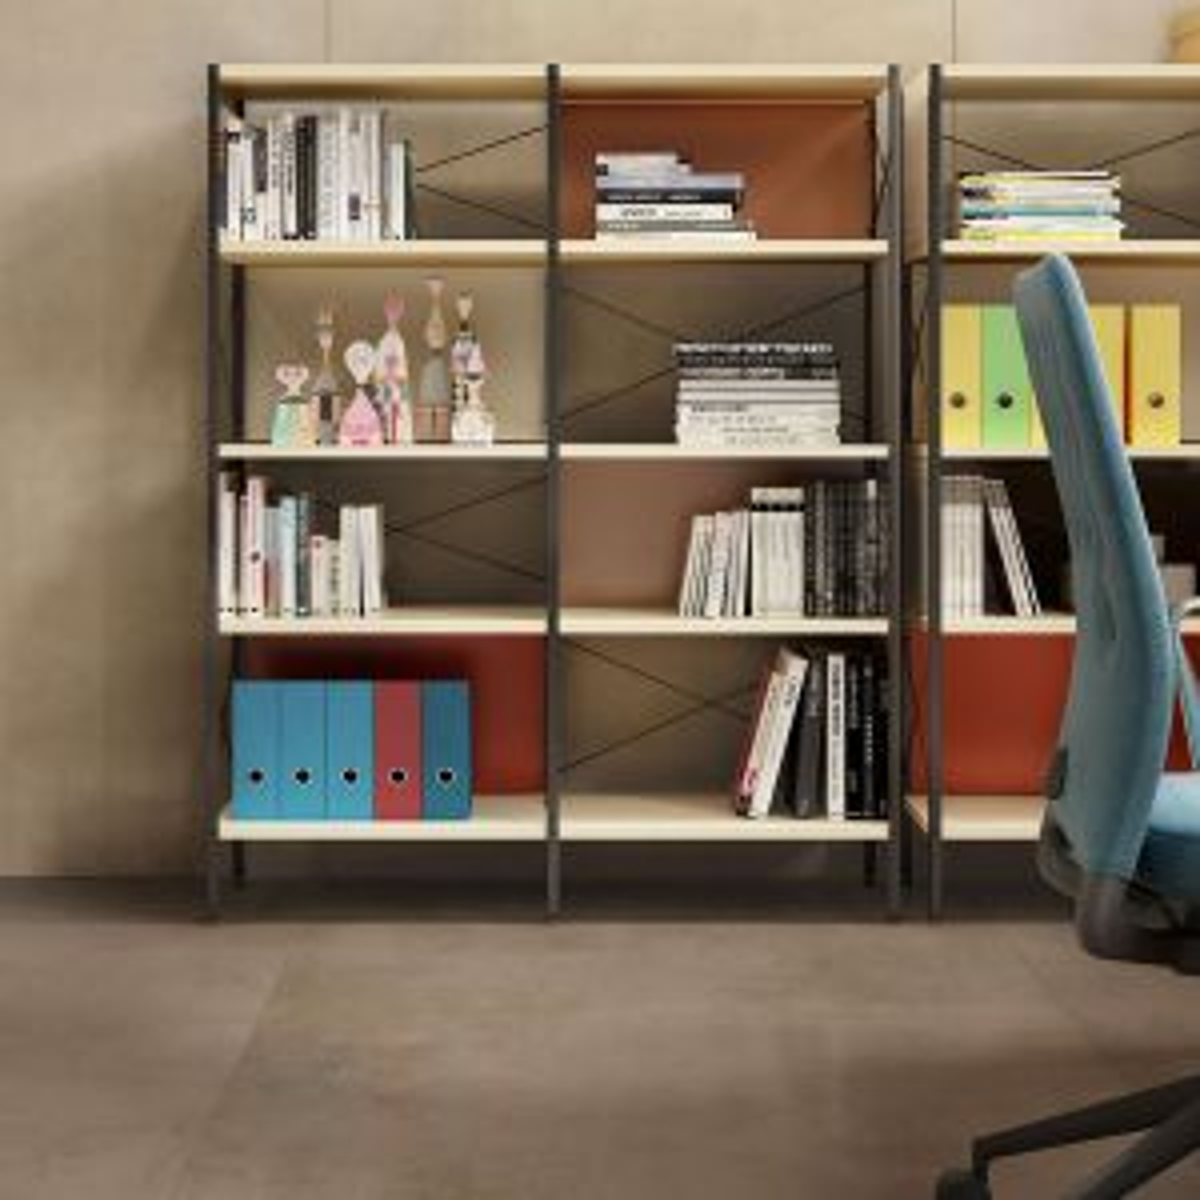 RAK Surface Mid Grey Matt Tile 600 x 1200mm Lifestyle